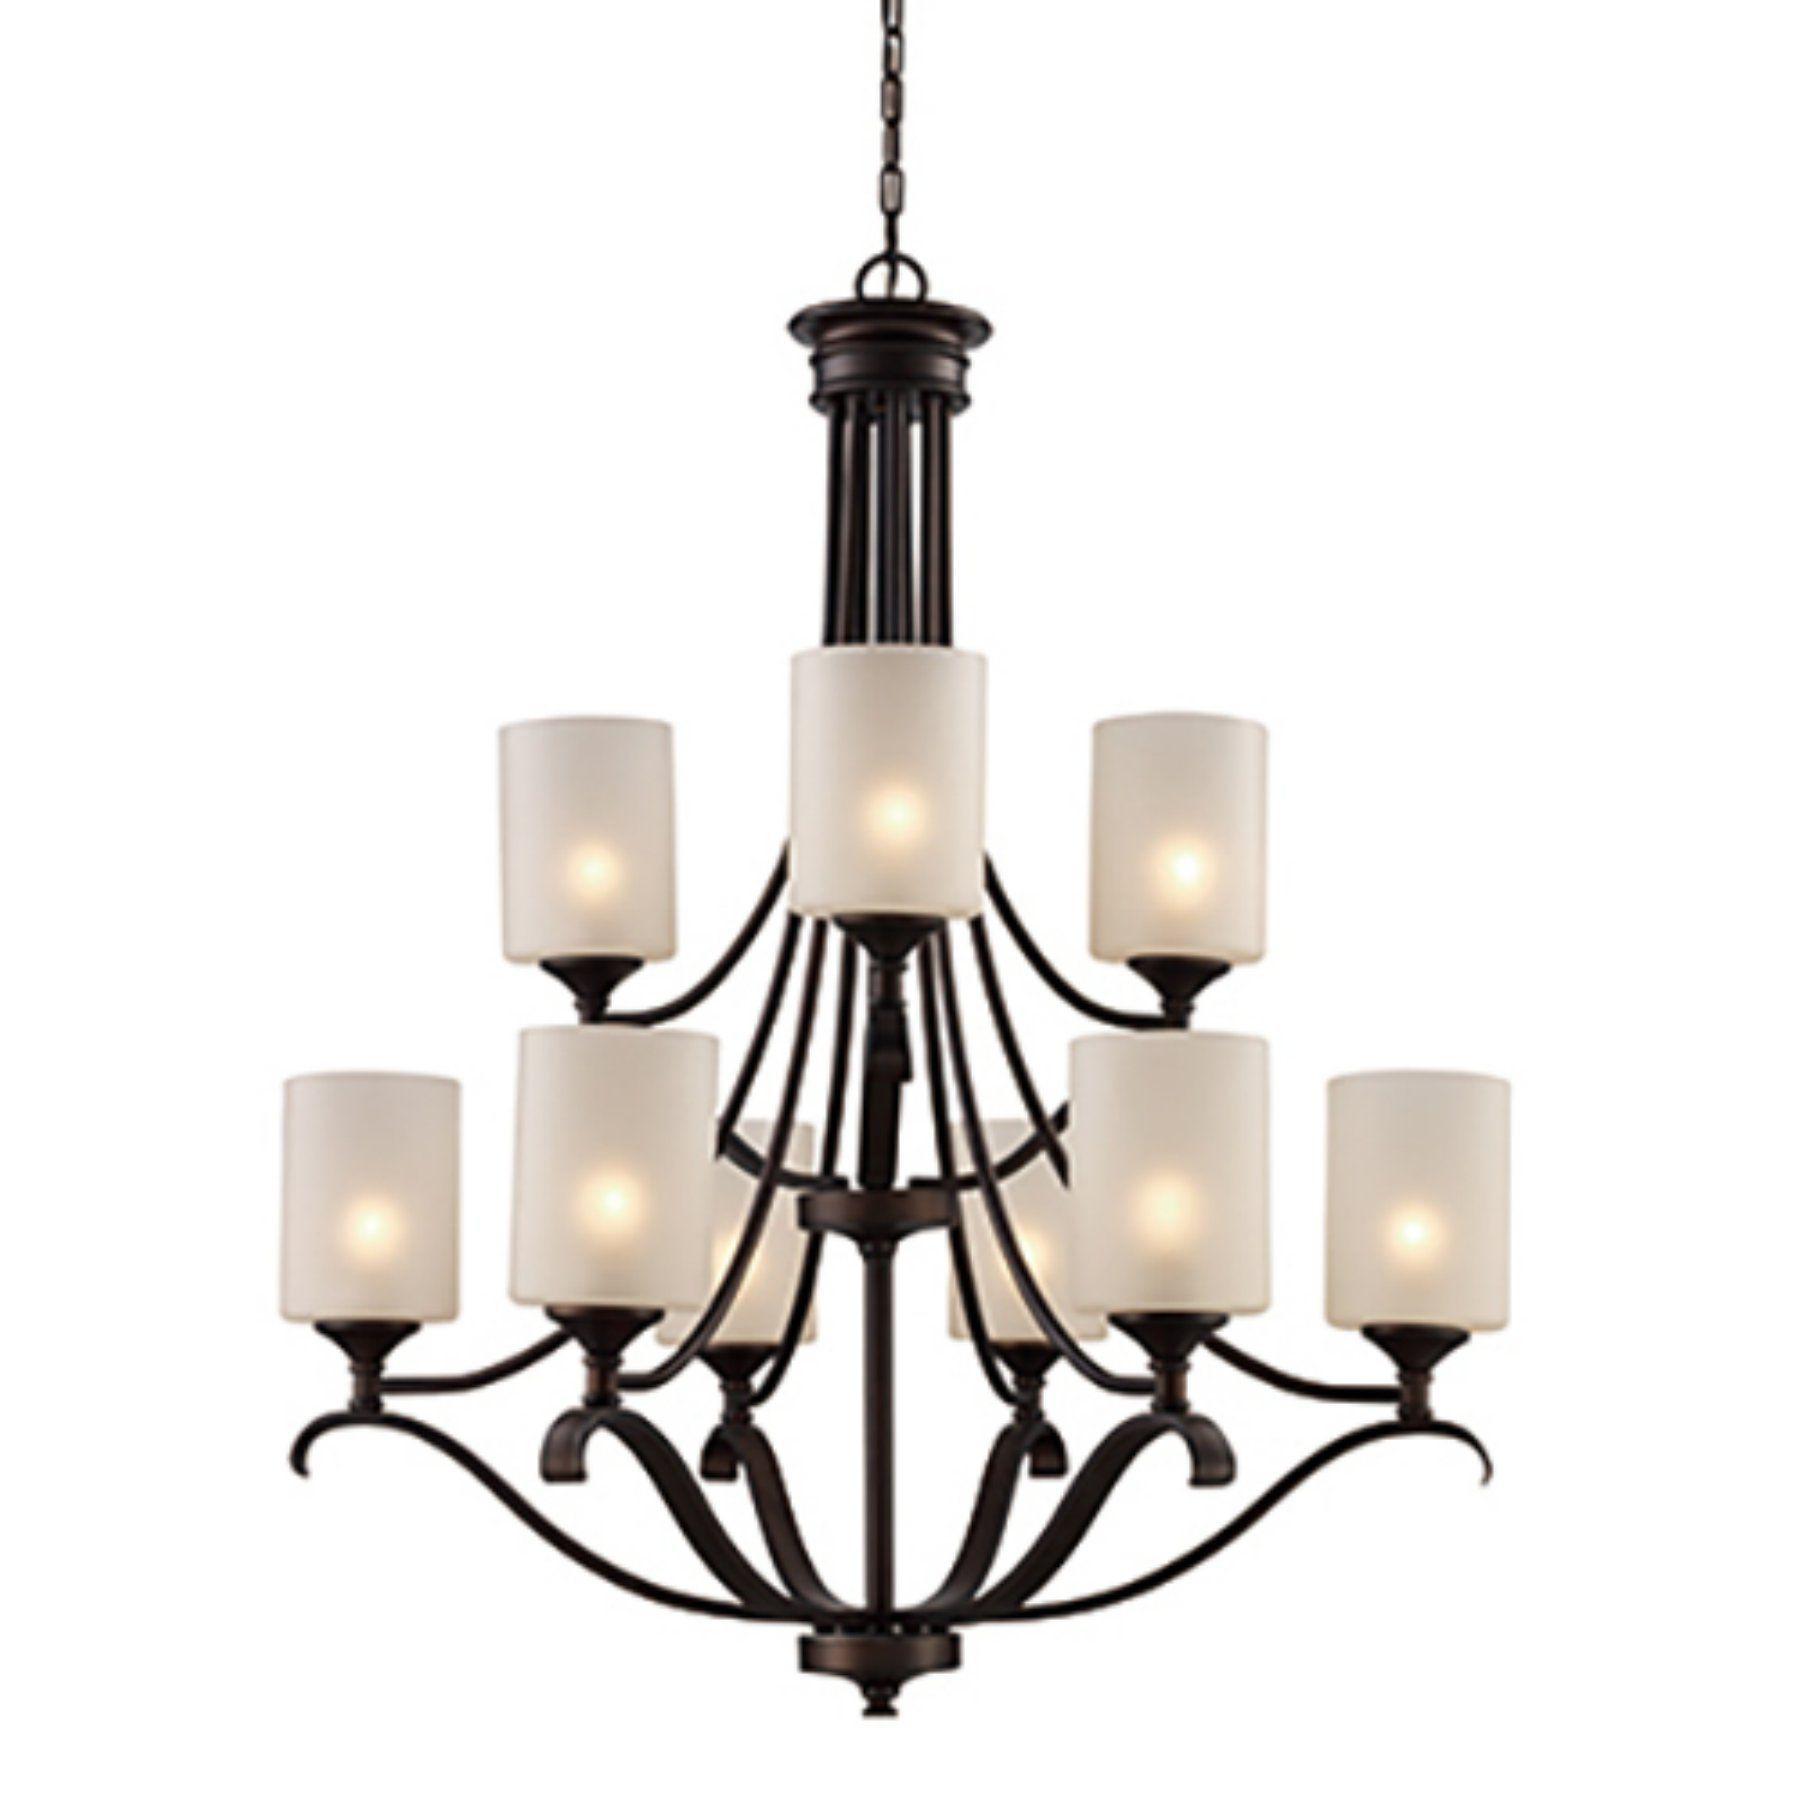 Trans Globe Lighting Ballard 70669 Chandelier - 70669 ROB